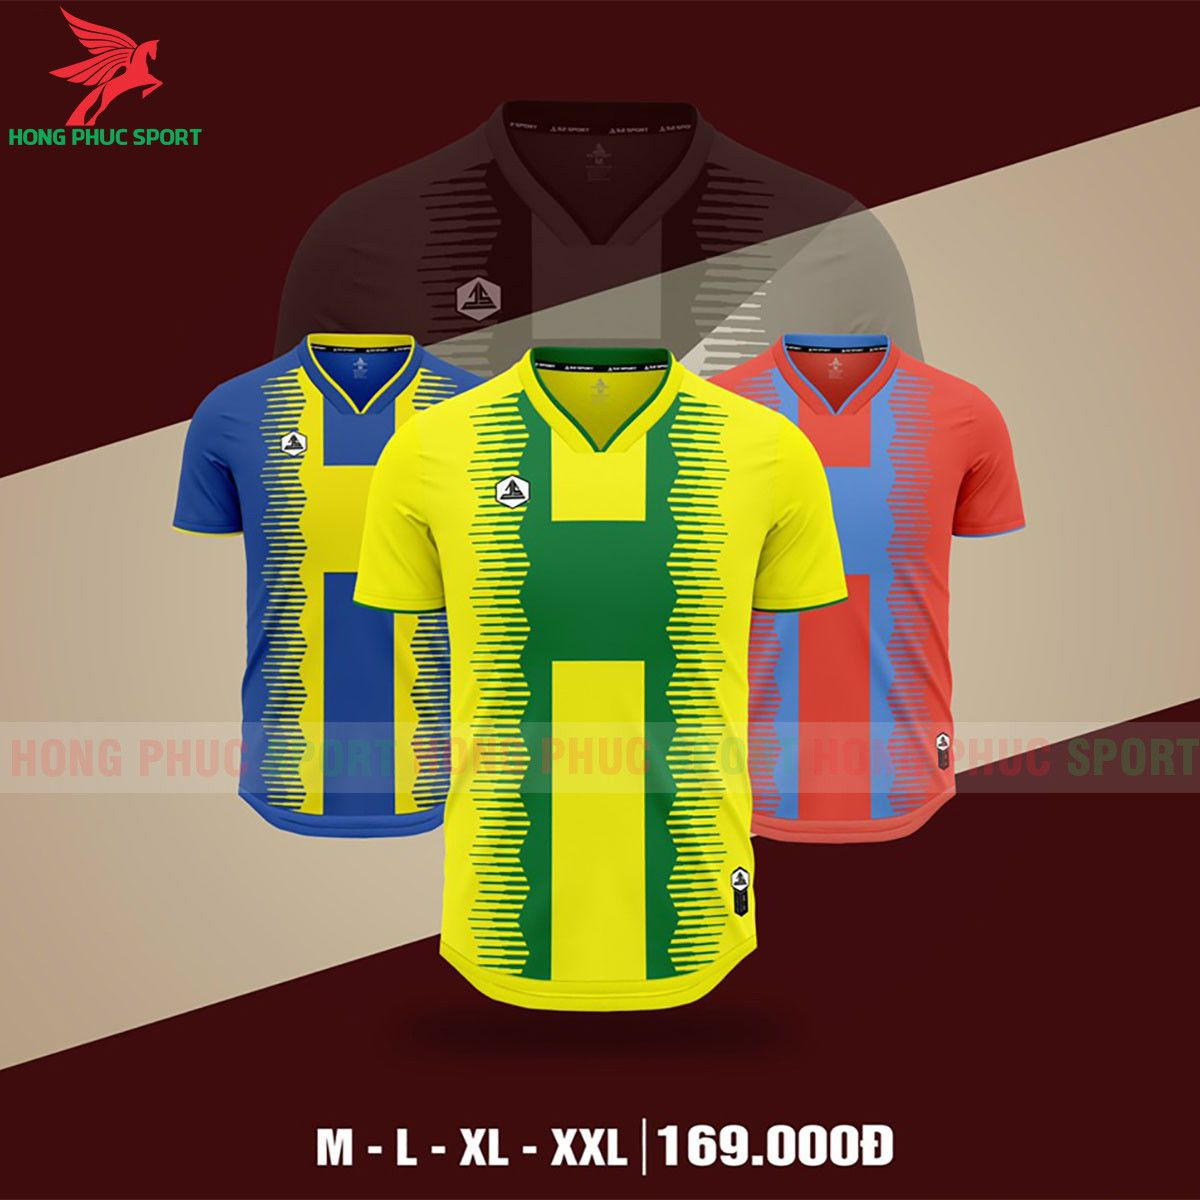 https://cdn.hongphucsport.com/unsafe/s4.shopbay.vn/files/285/ao-bong-da-khong-logo-authentic-2021-comienzo-vang-60f5419e1344b.jpg